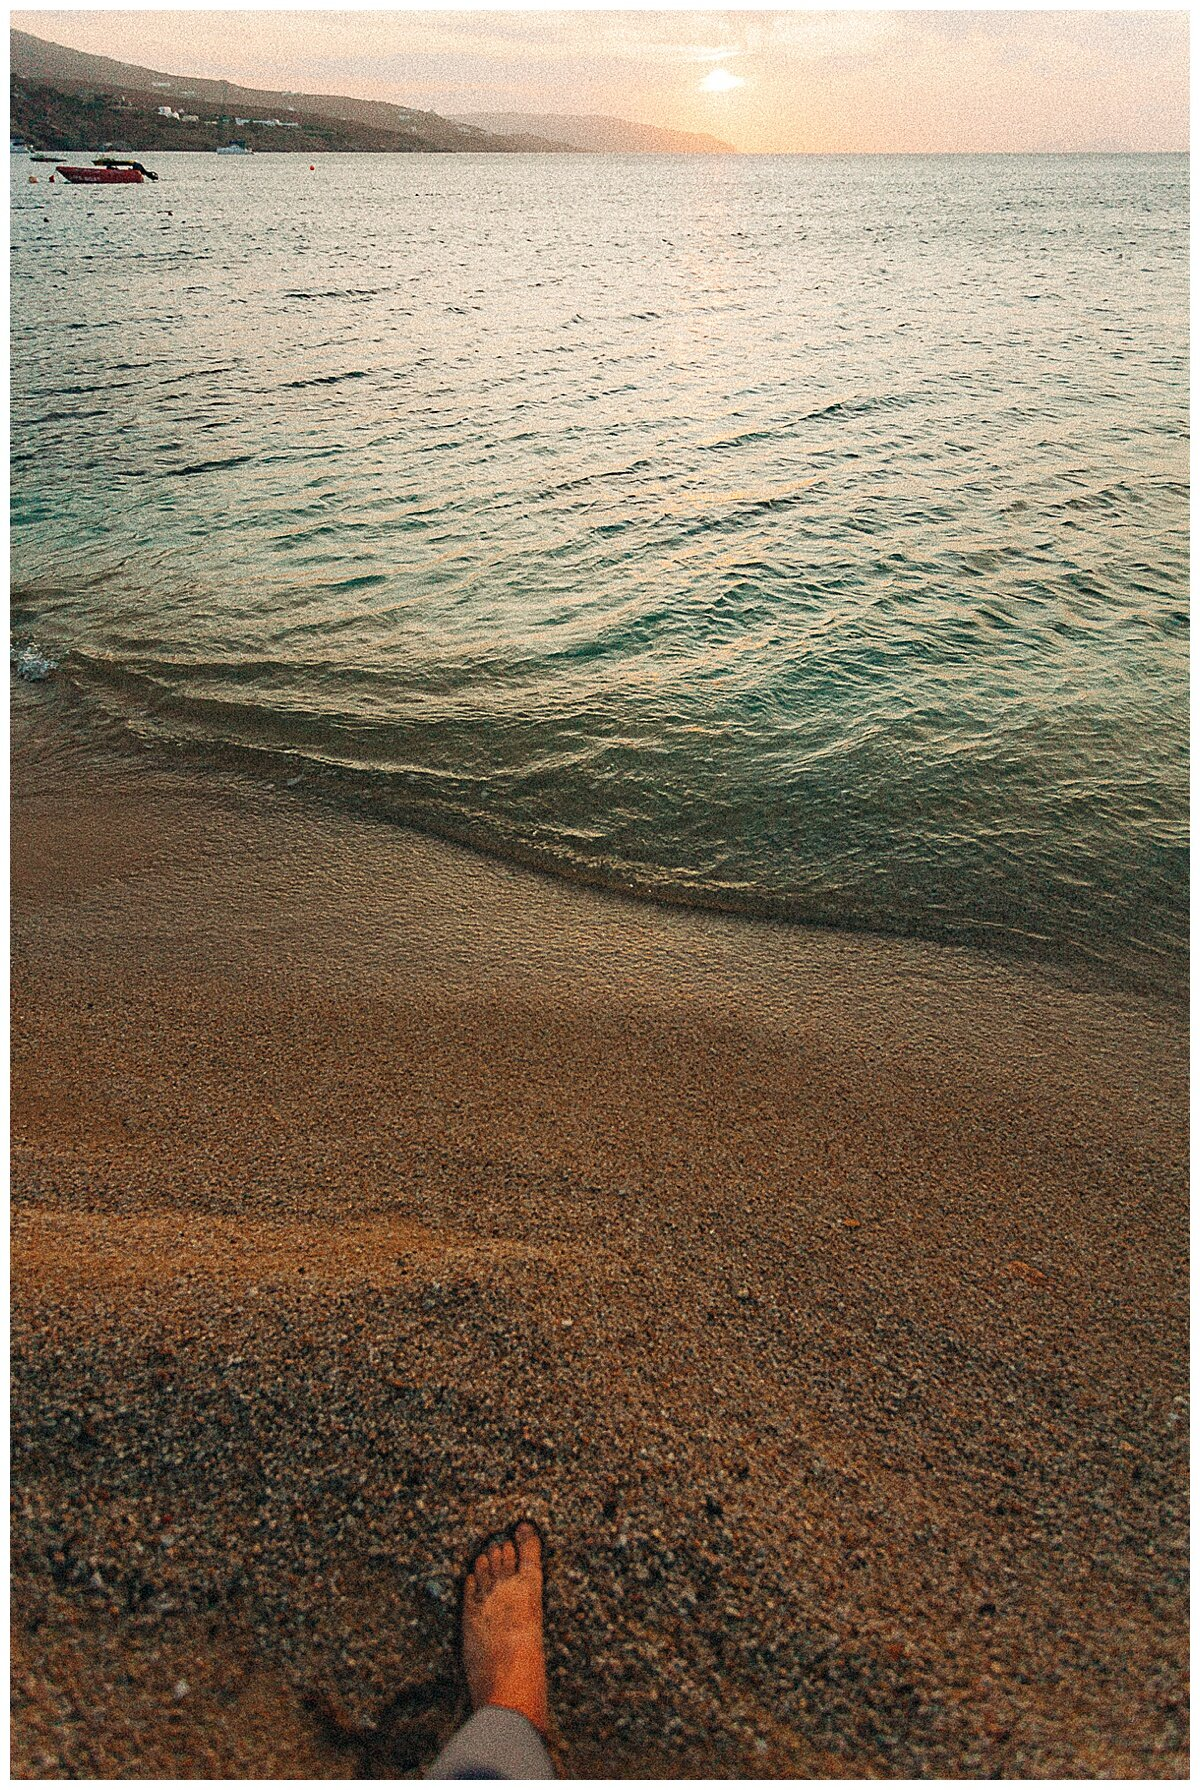 VENICE-COUPLE-PHOTOSHOOT-film-fuji-400h-stefano-degirmenci_0866.jpg